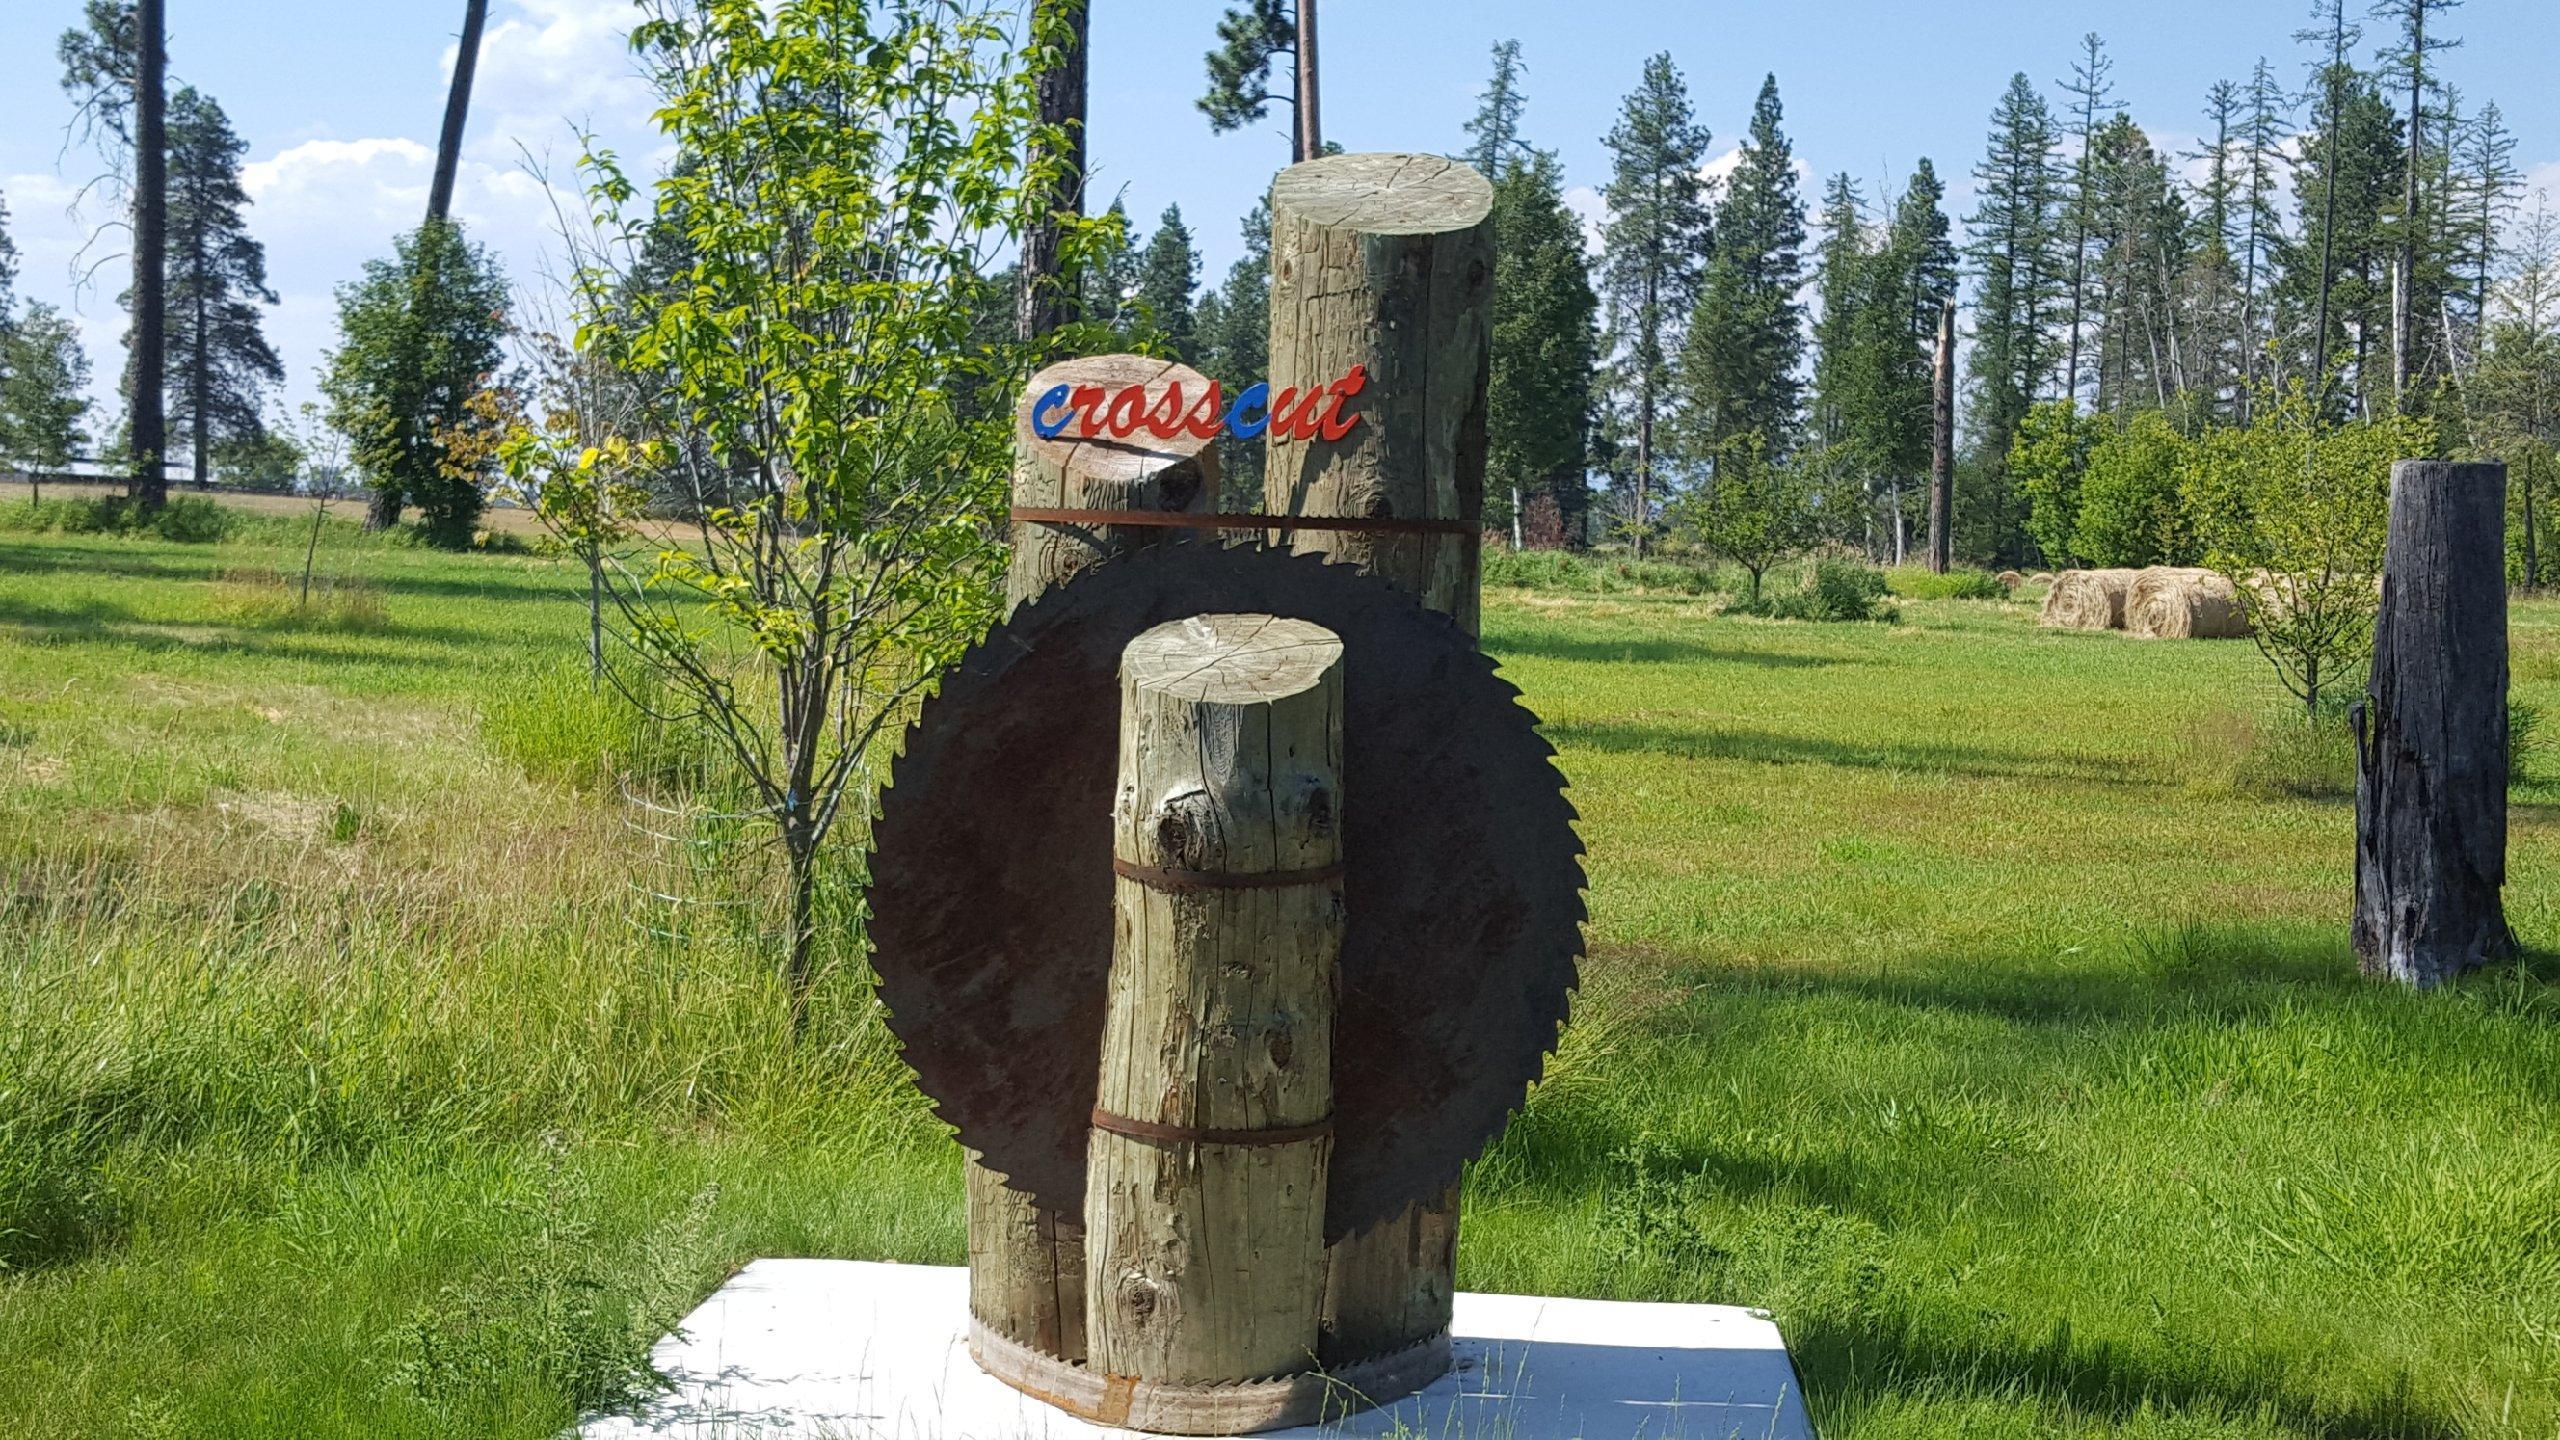 112 Timber Axe Lane, Columbia Falls, MT 59912